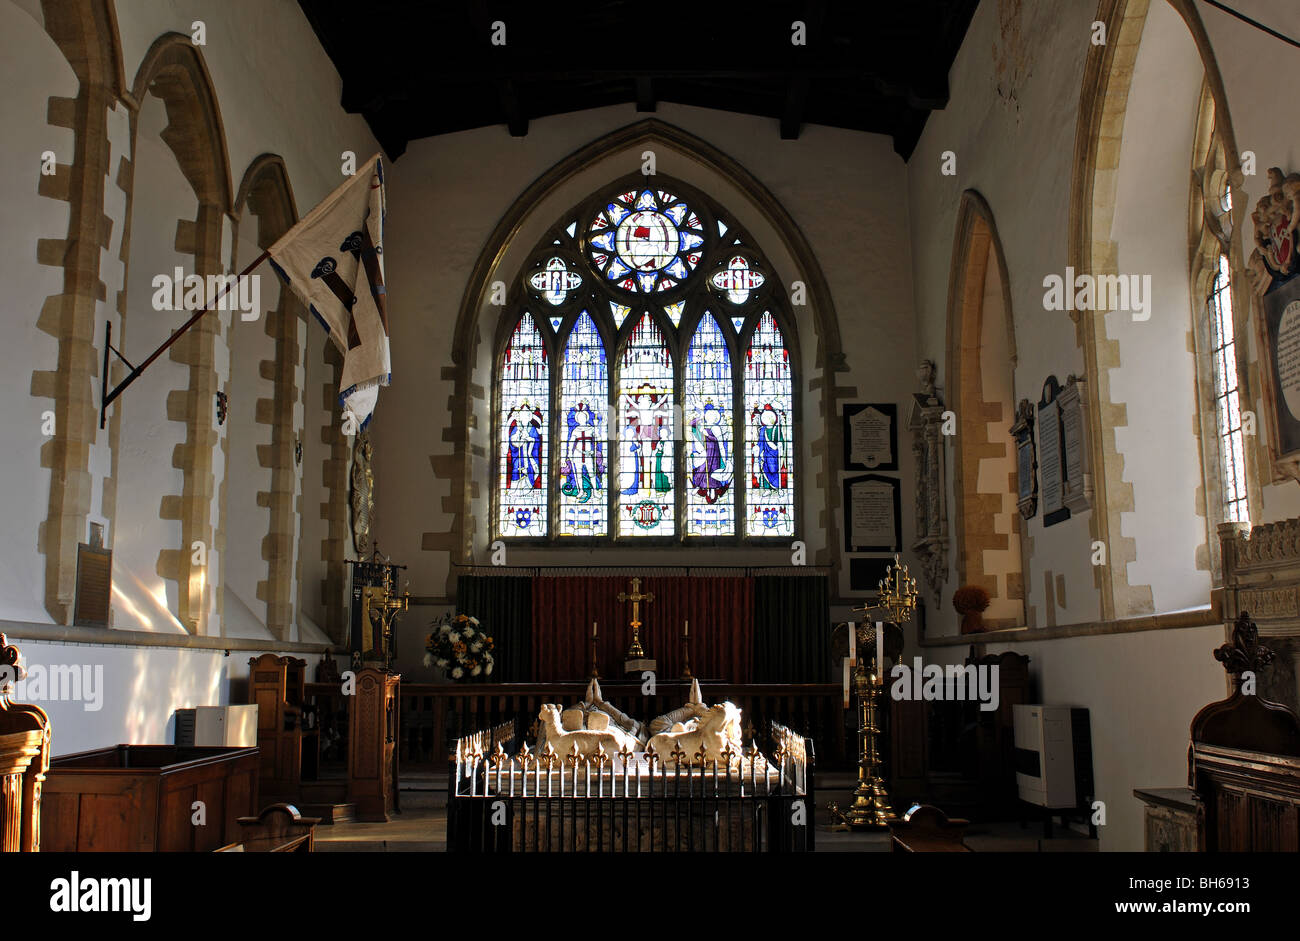 St. Mary`s Church, Thame, Oxfordshire, England, UK - Stock Image